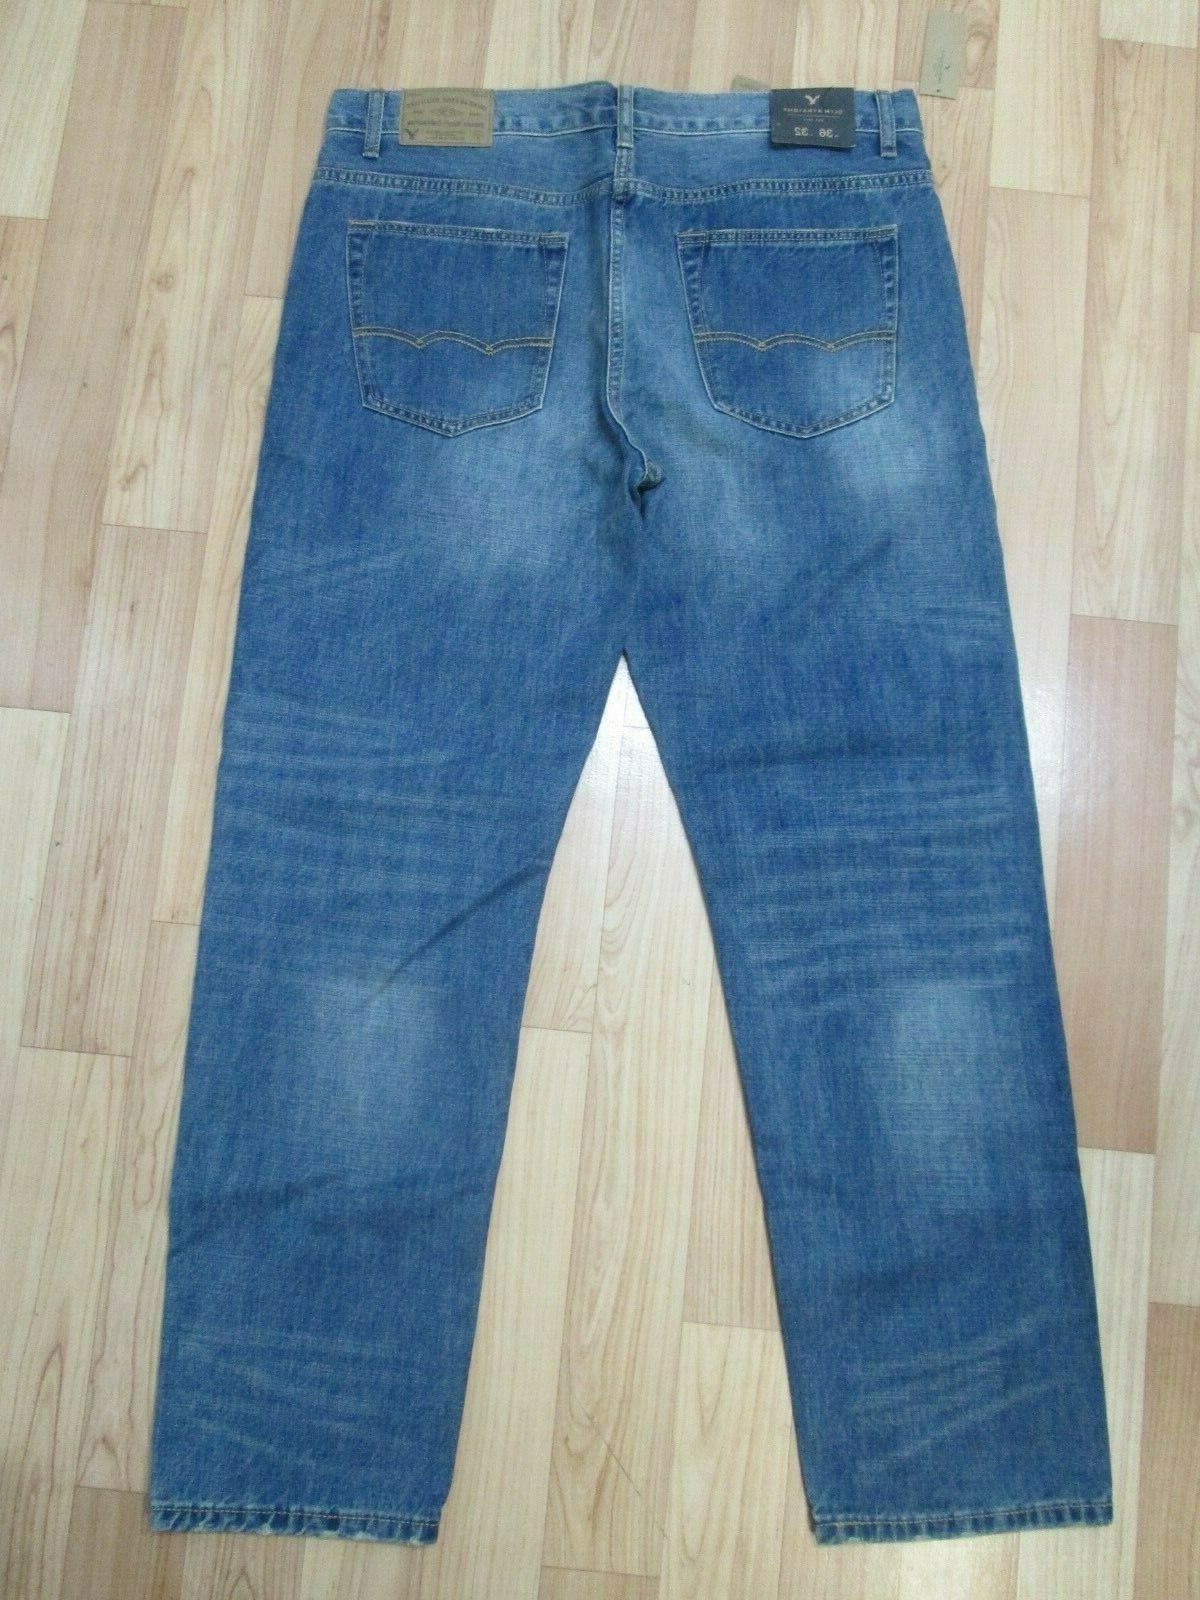 NWT American Medium Wash Tinted Slim Jeans 36/32